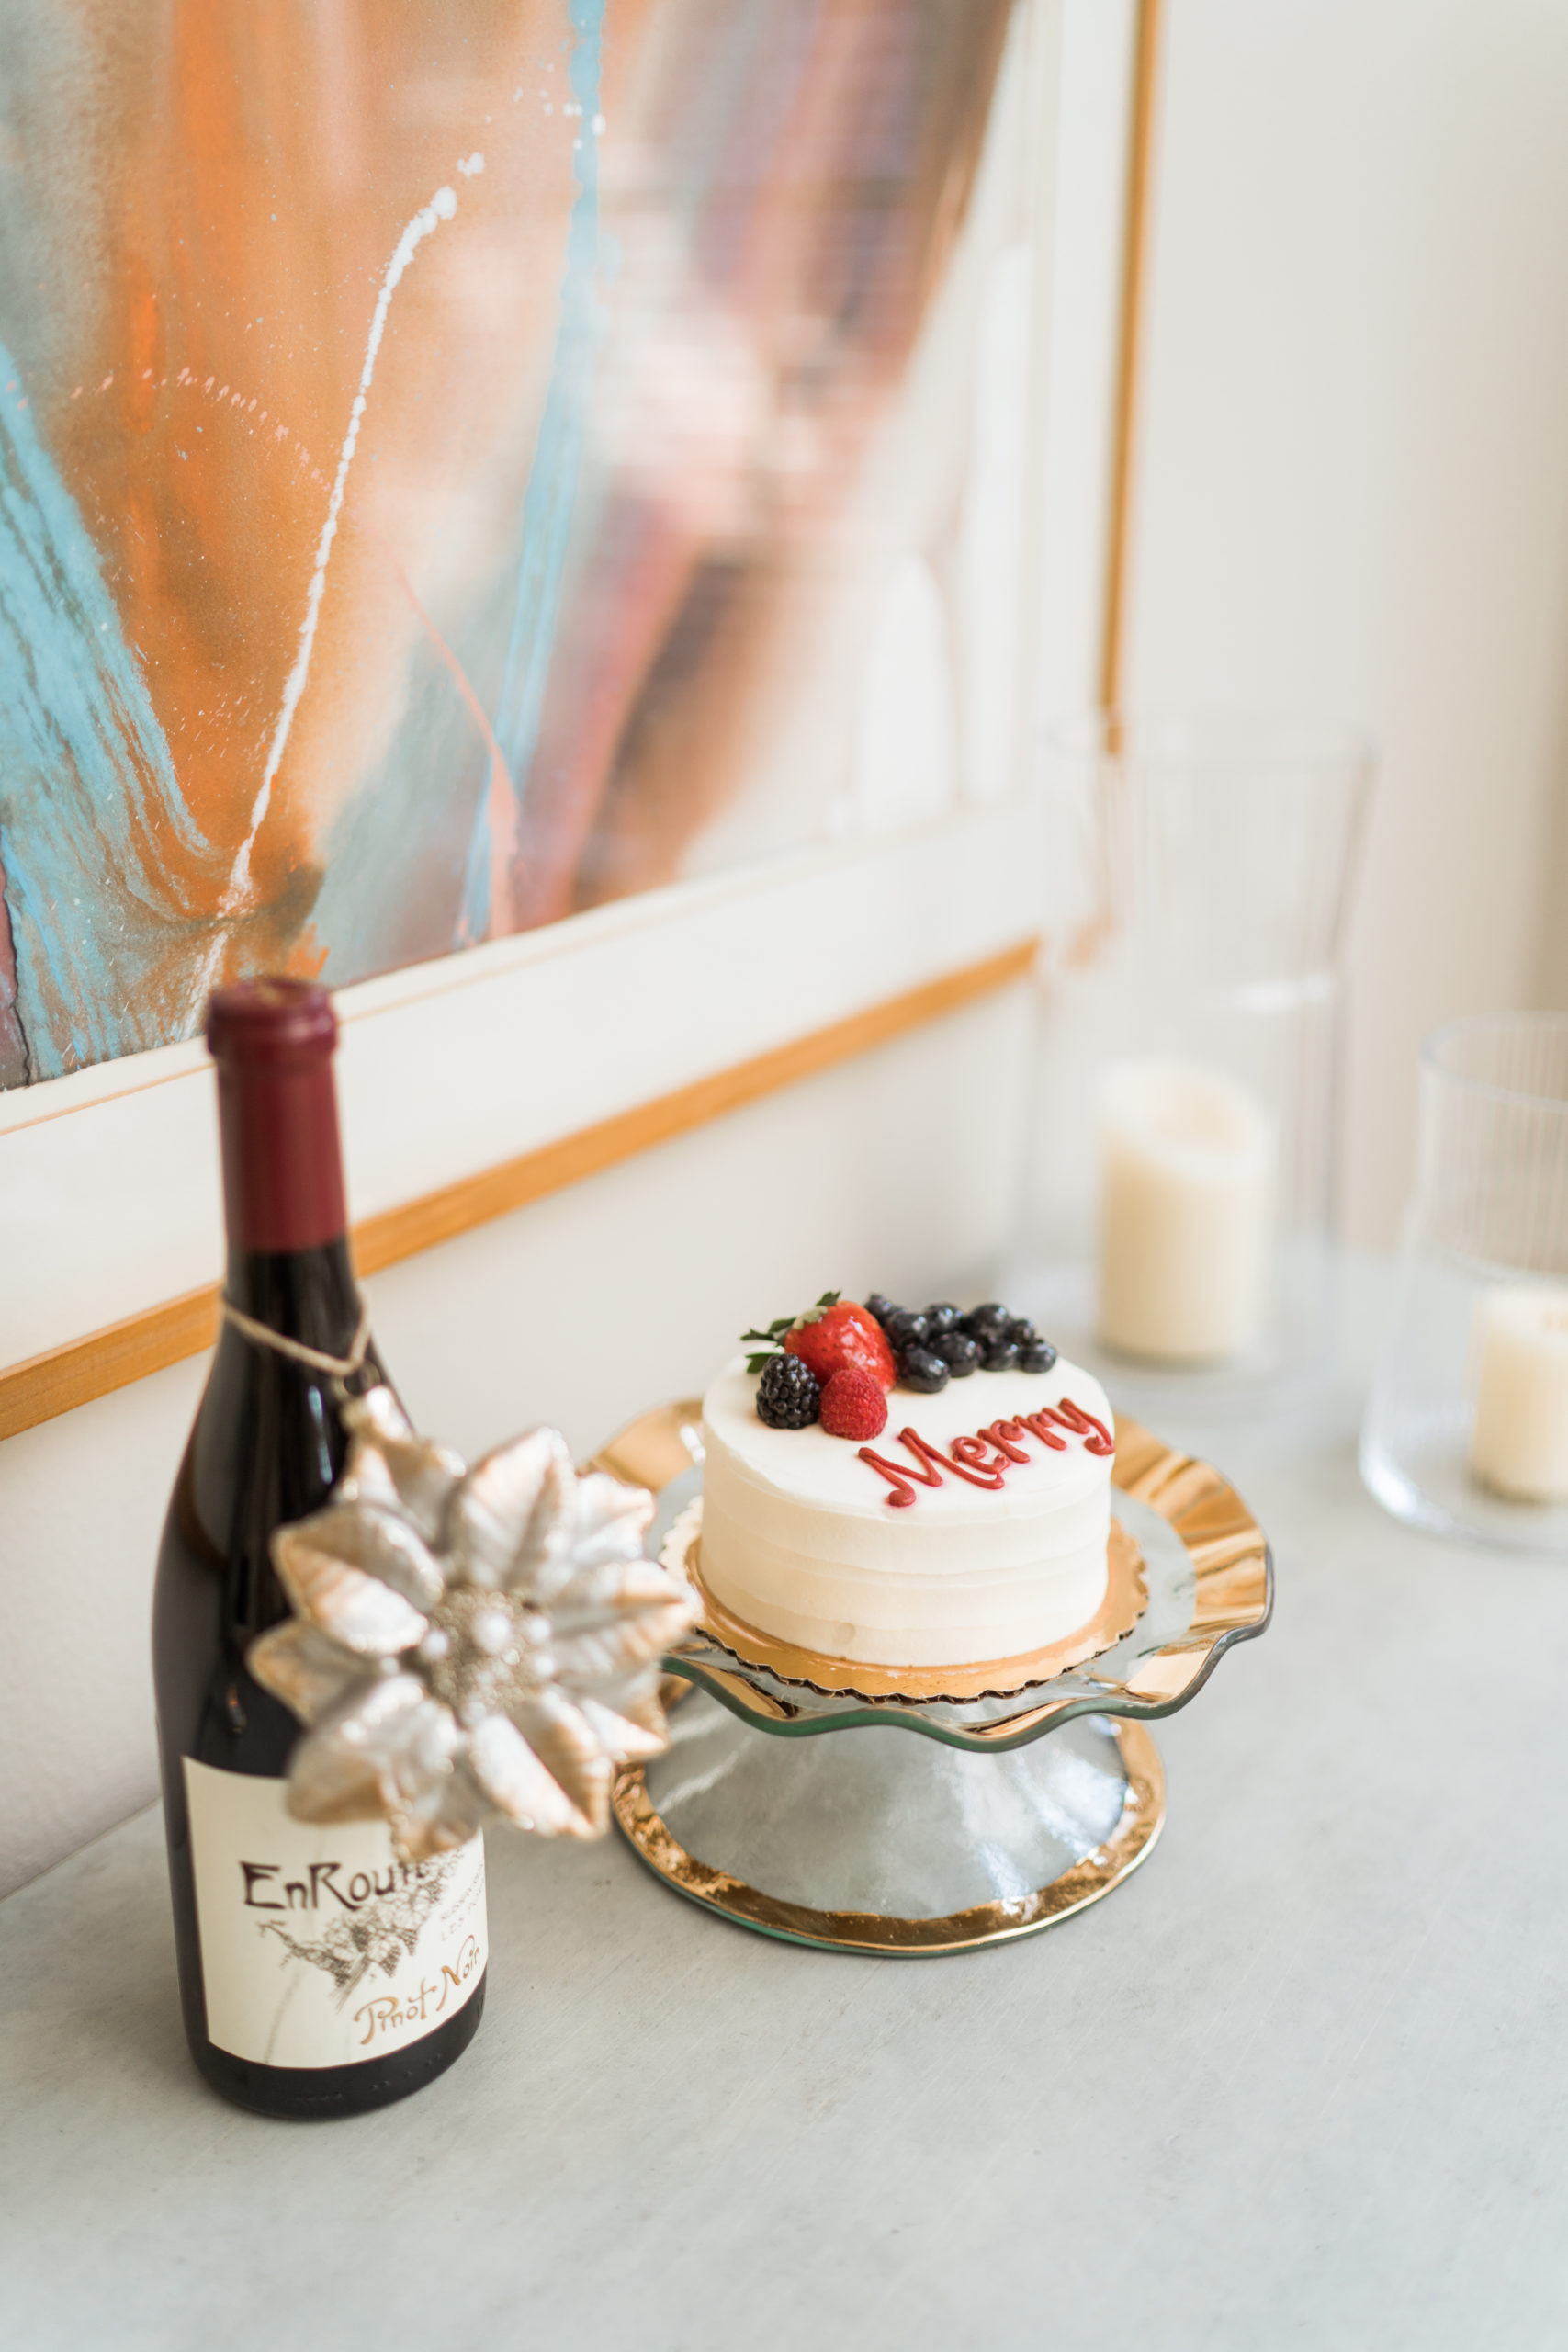 Annie Glass cake plate for Christmas